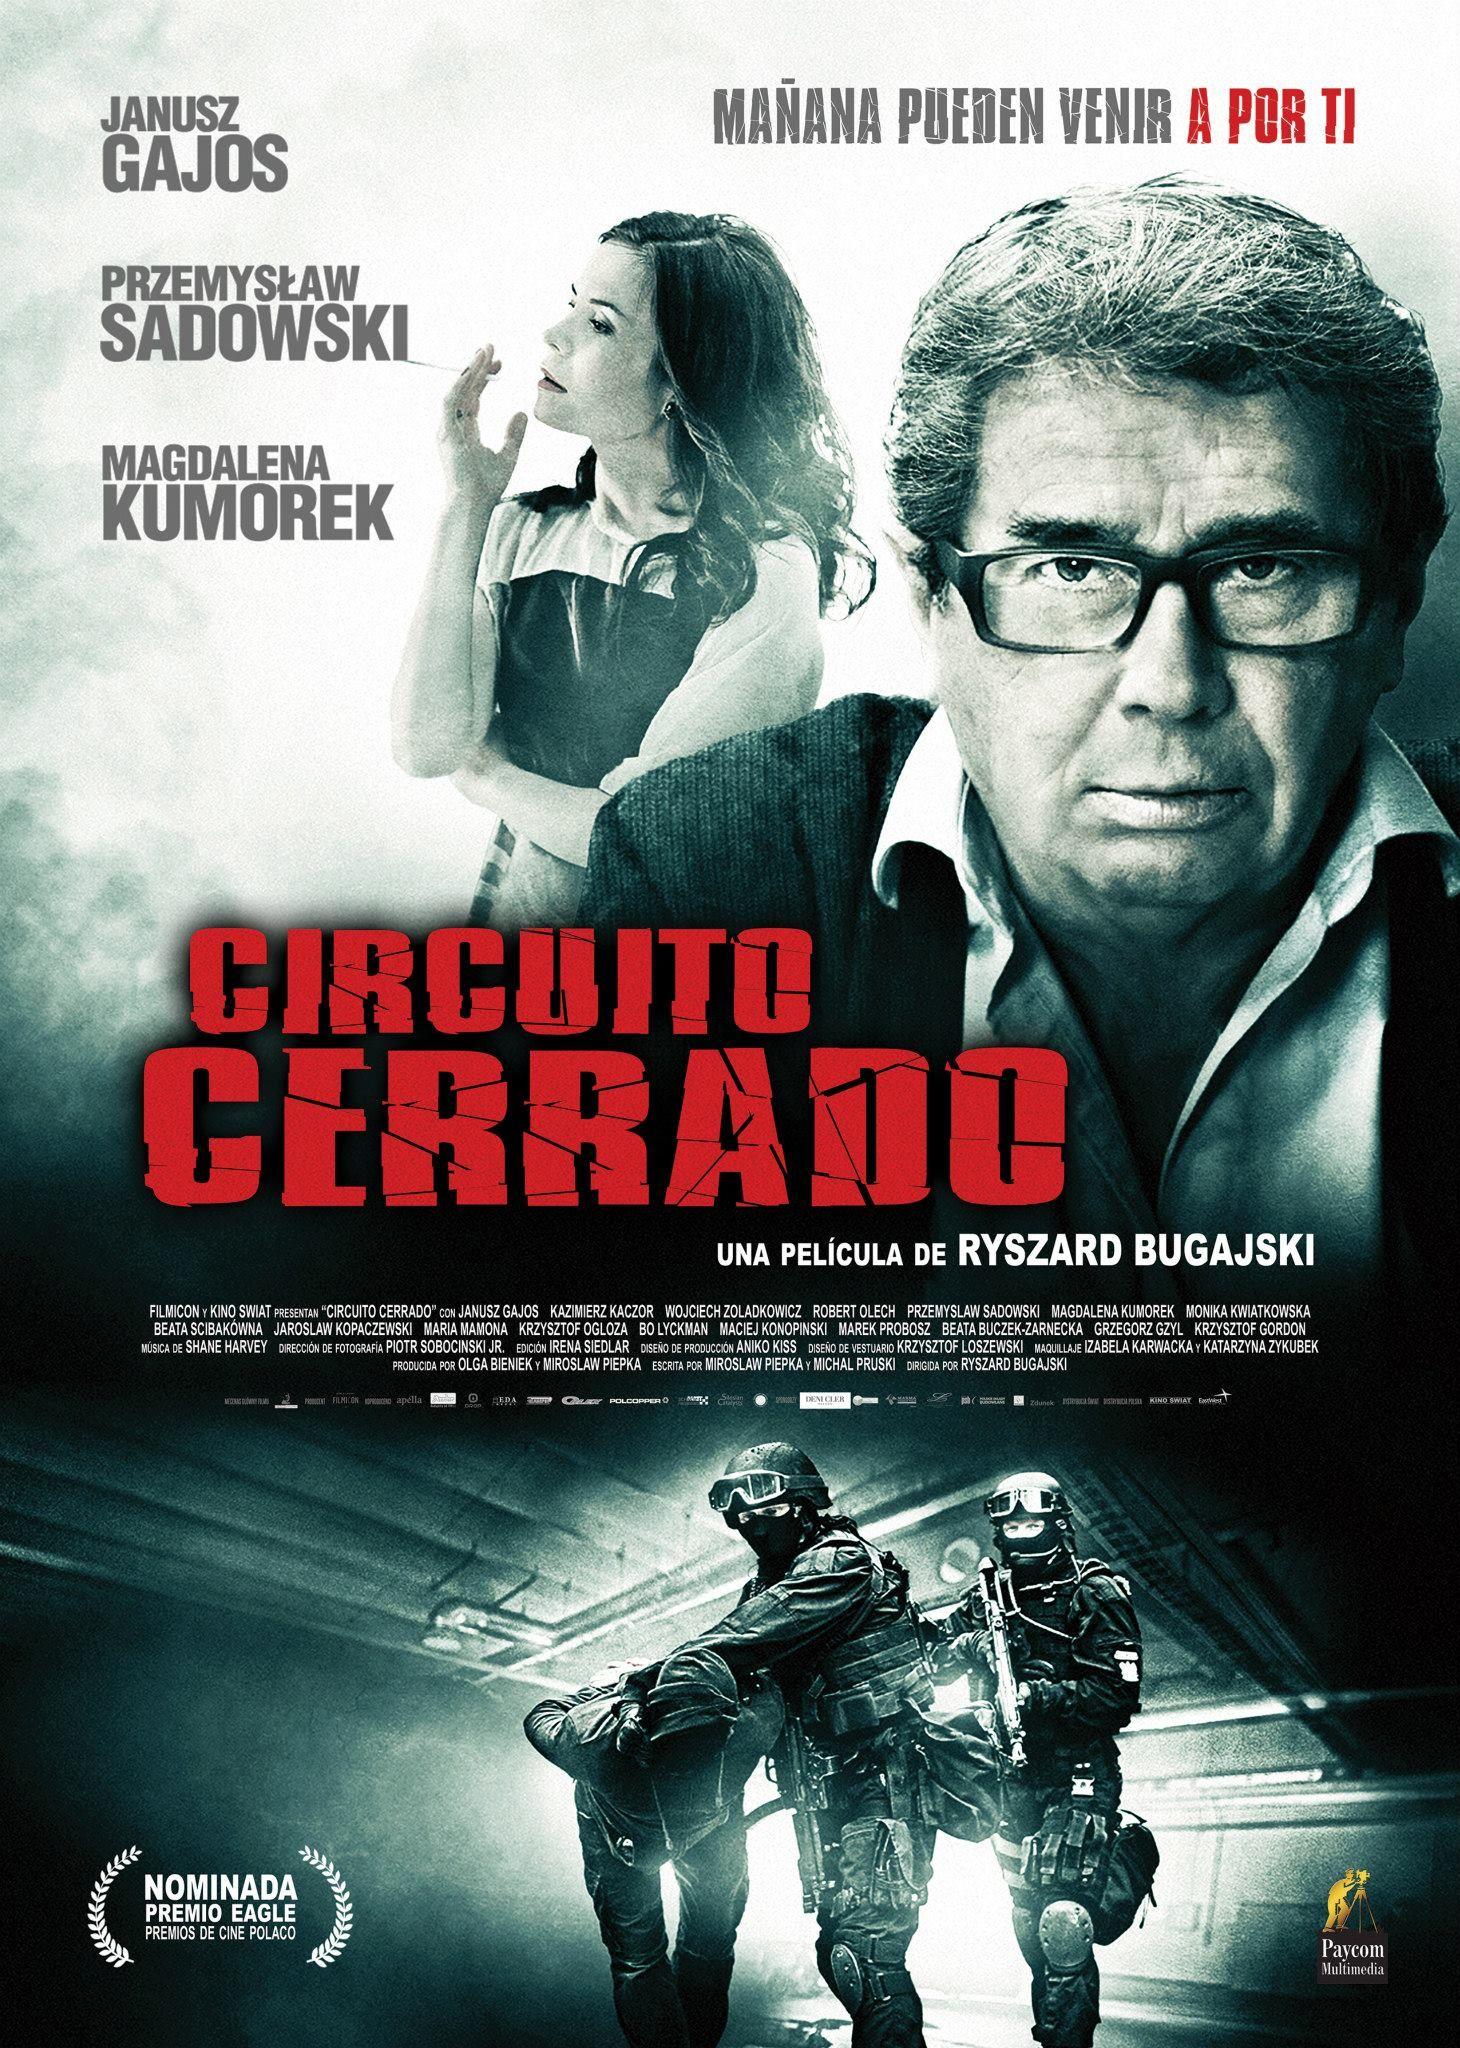 2013 - Circuito Cerrado - Uklad zamkniety - tt2807624